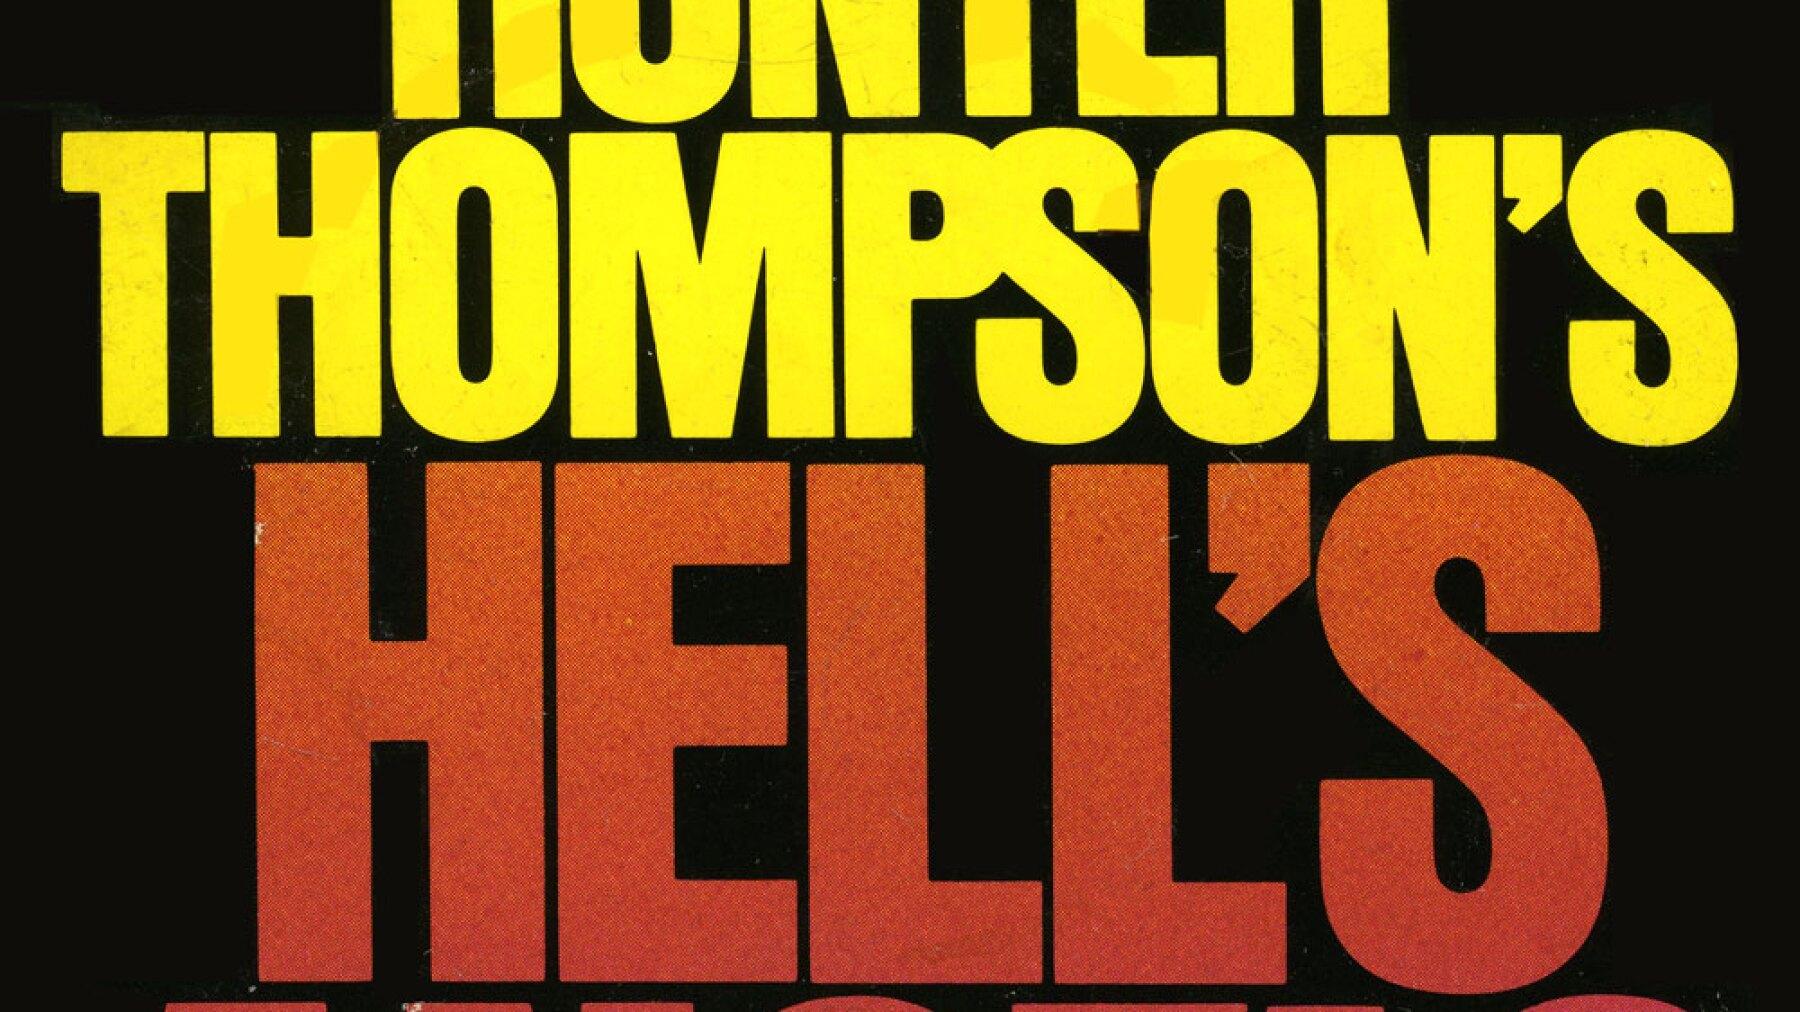 Hell's Angels de Hunter S. Thompson.